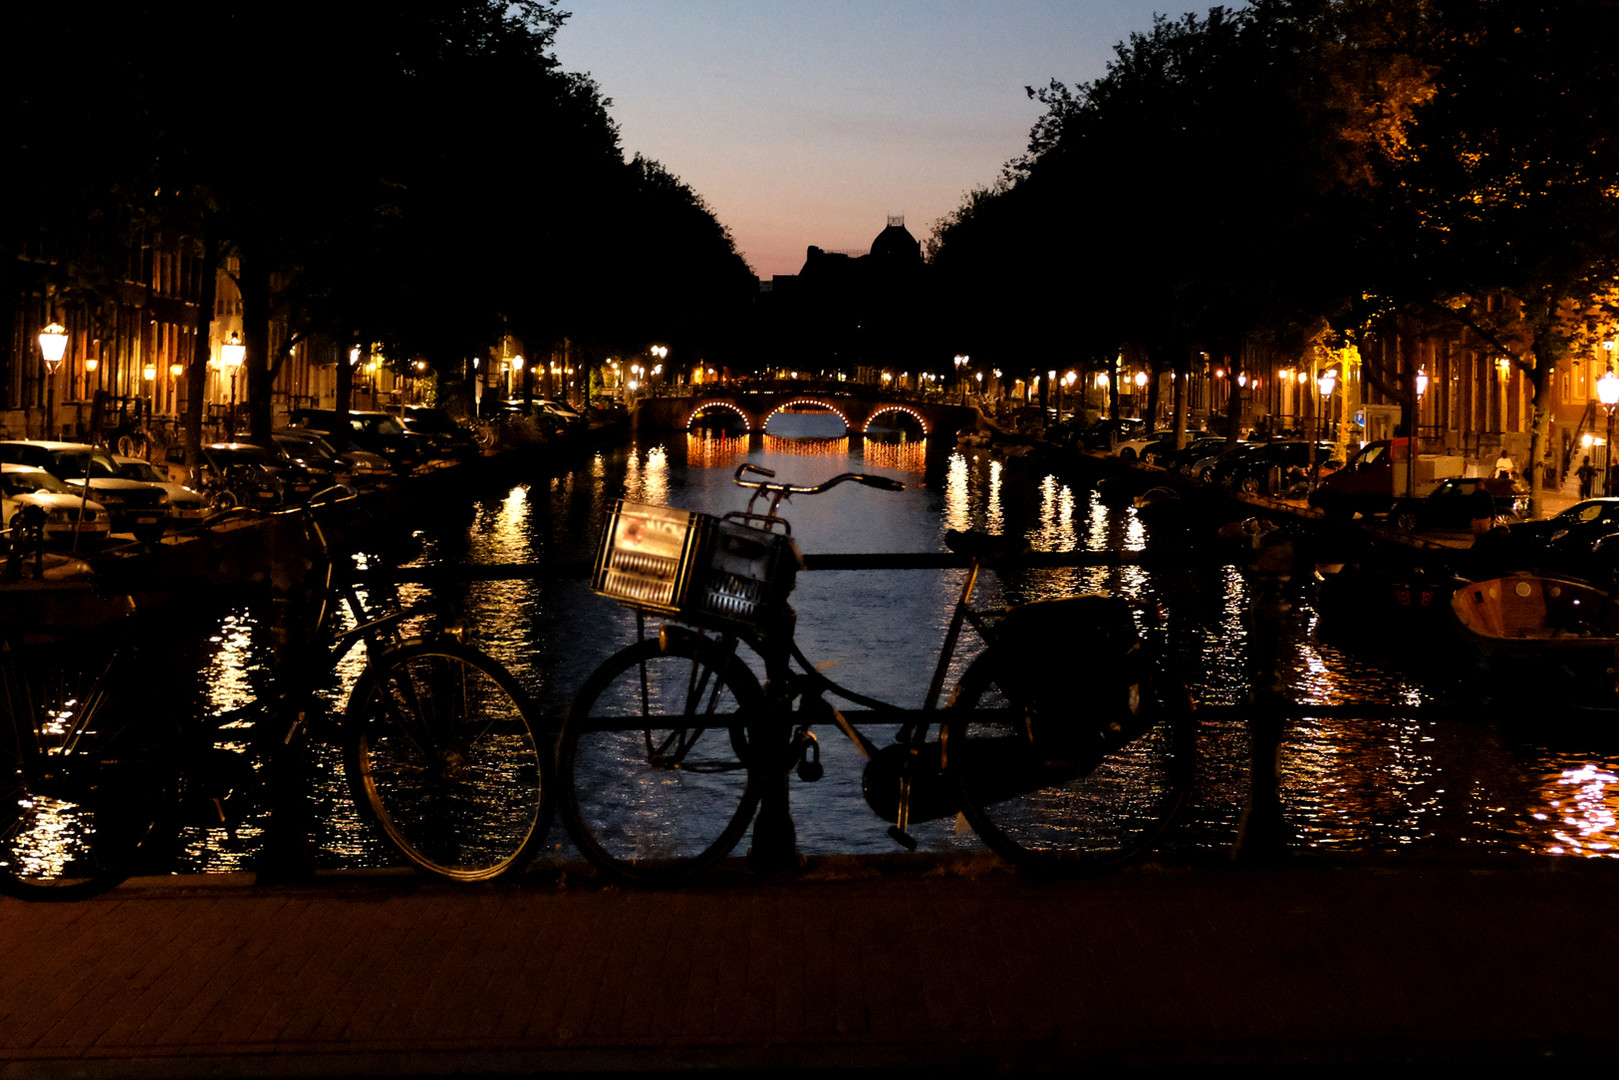 01-Amsterdam in 12800ISO.jpg